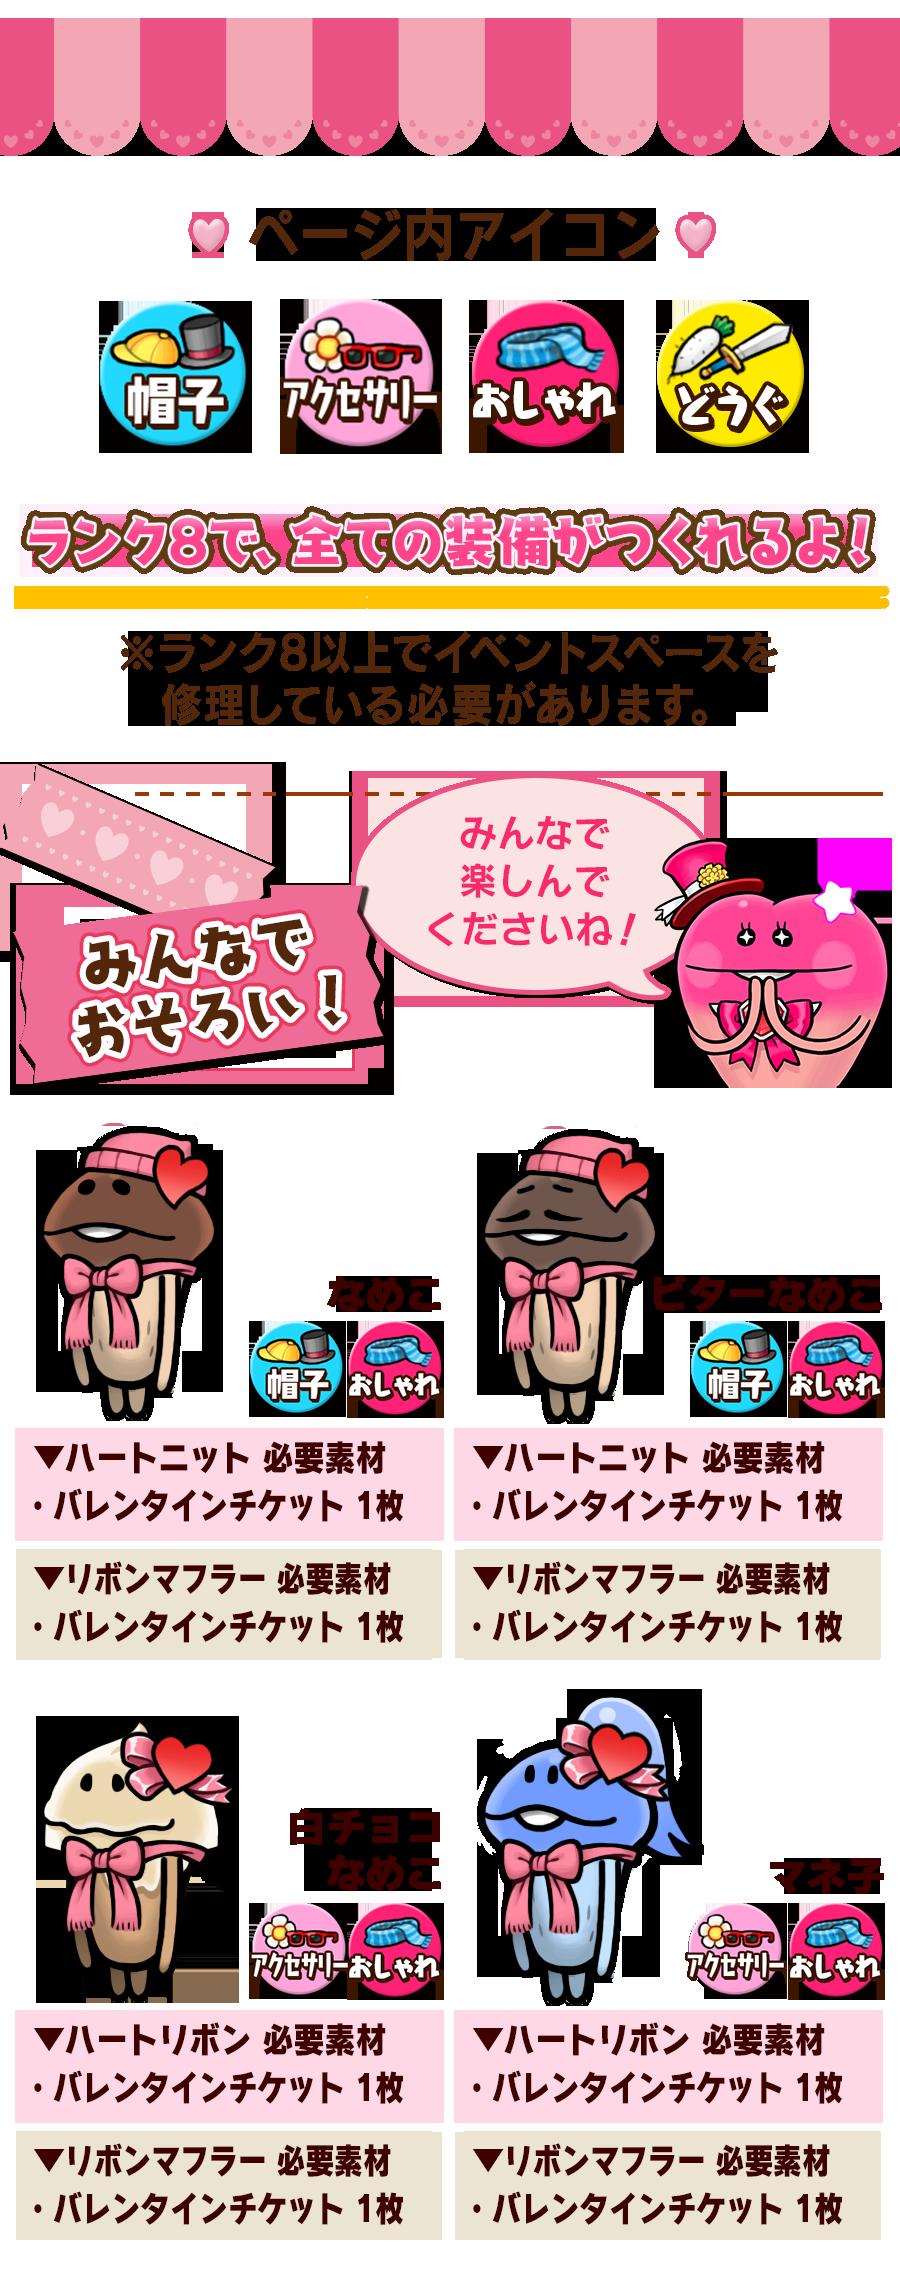 valentinechirashi02.png